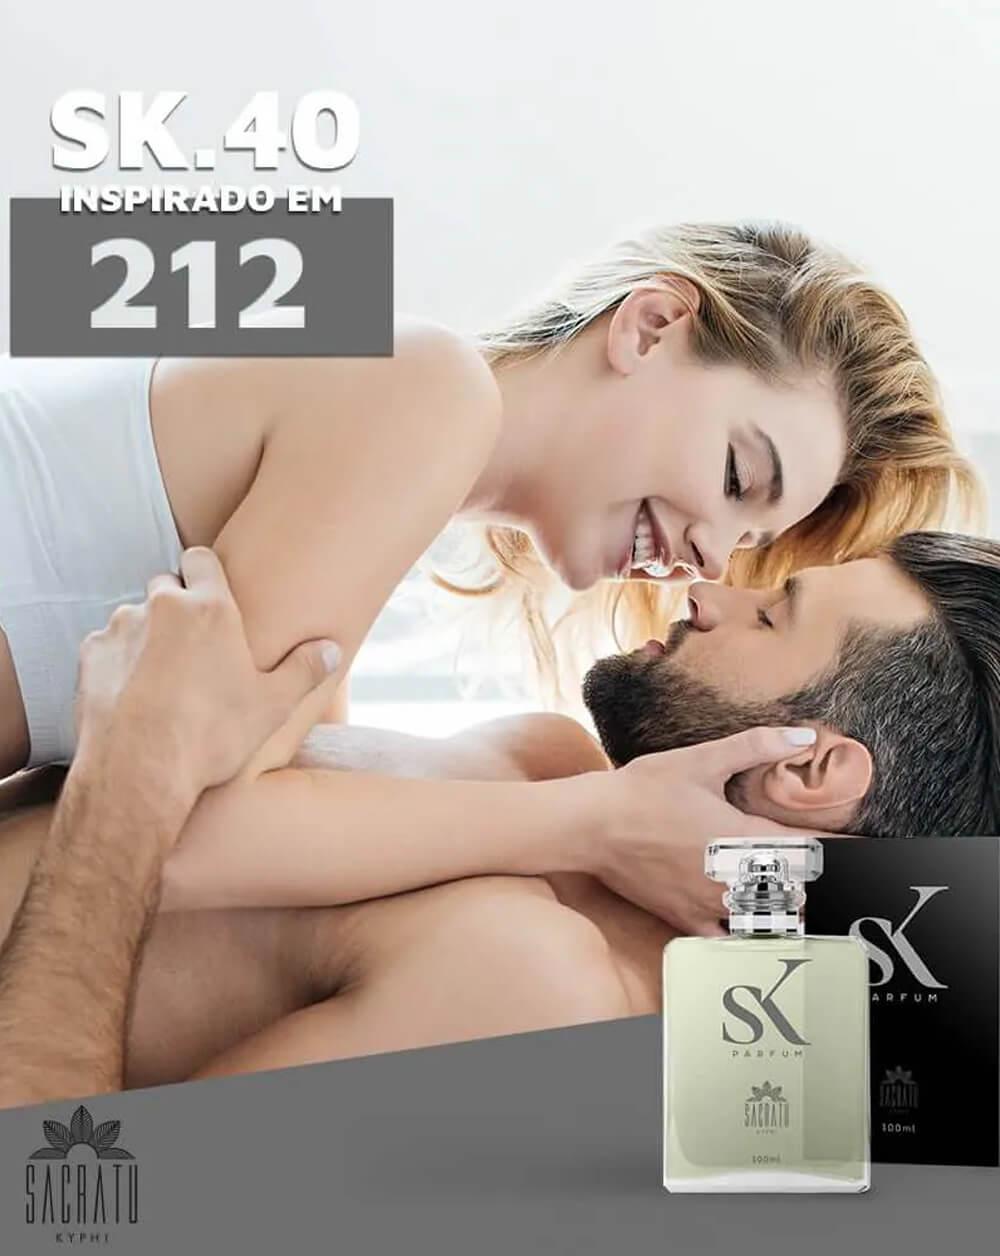 SK 40 Inspirado no 212 by Carolina Herrera